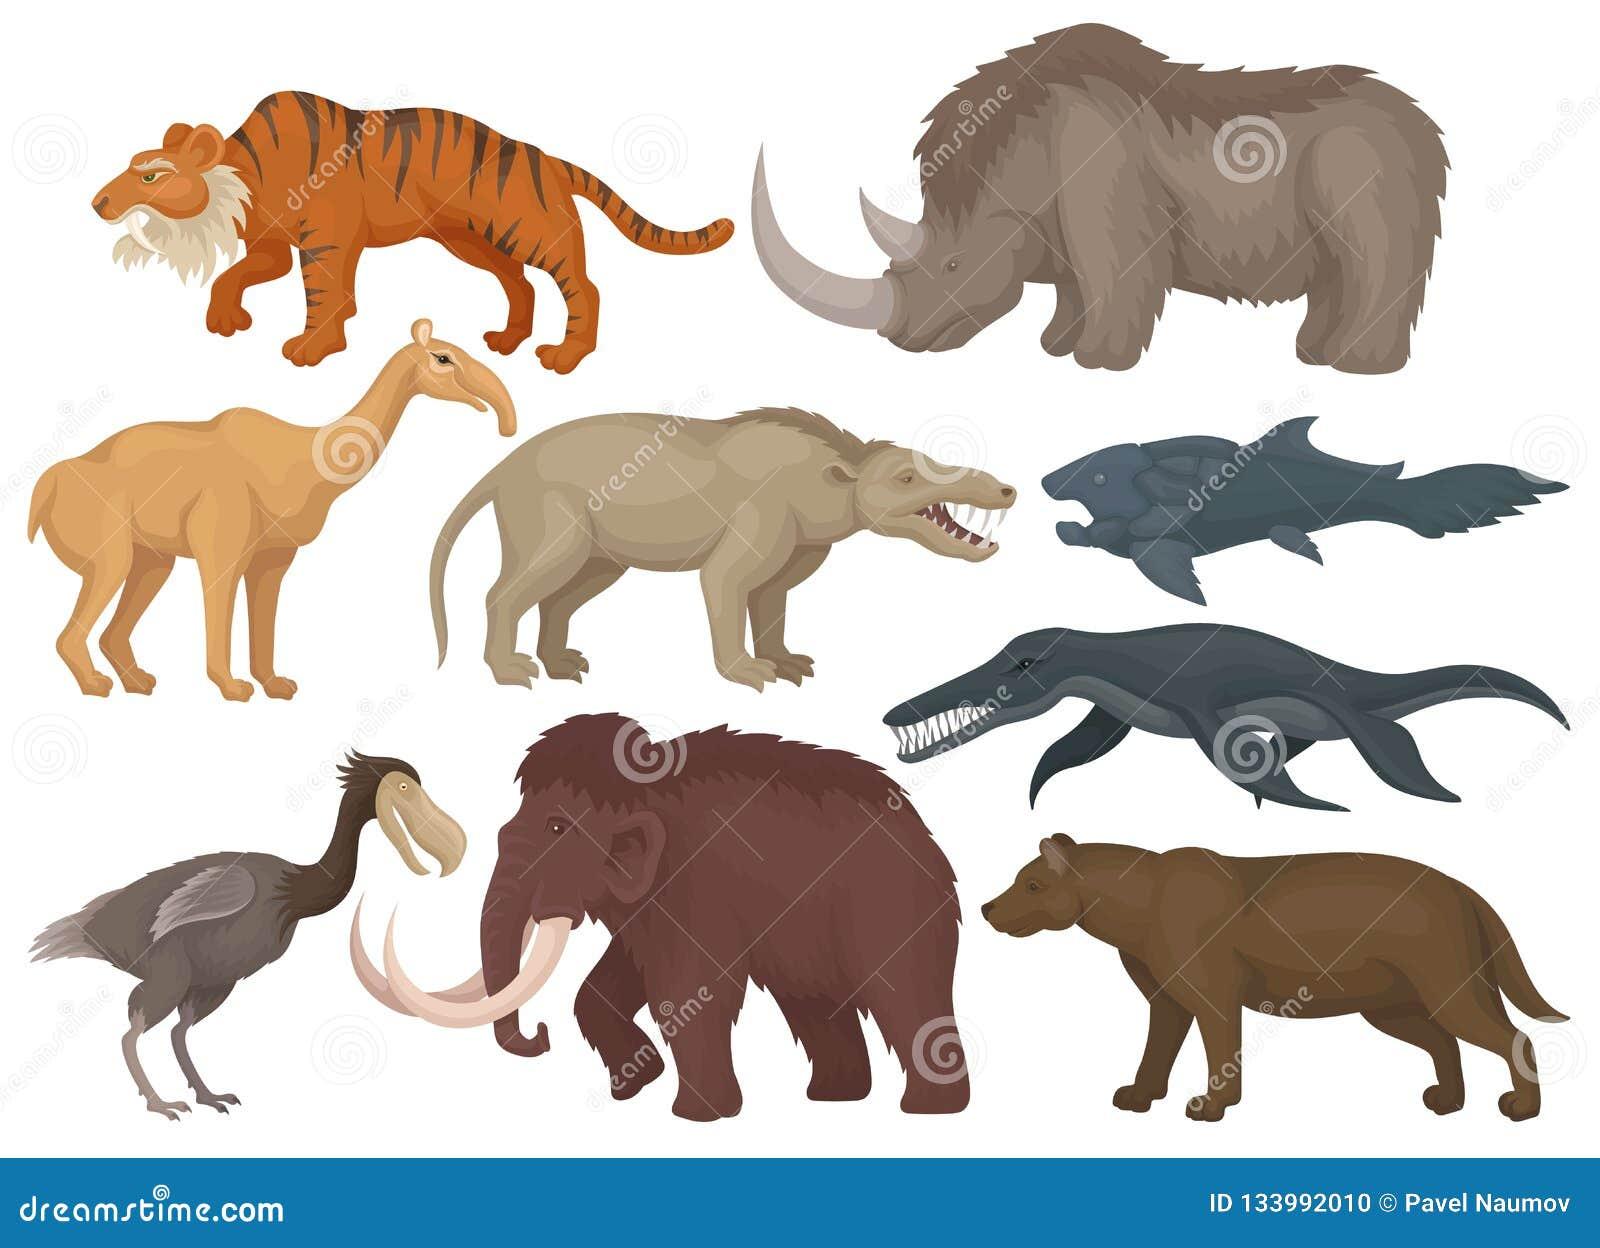 Flat Vector Set Of Different Extinct Prehistoric Animals